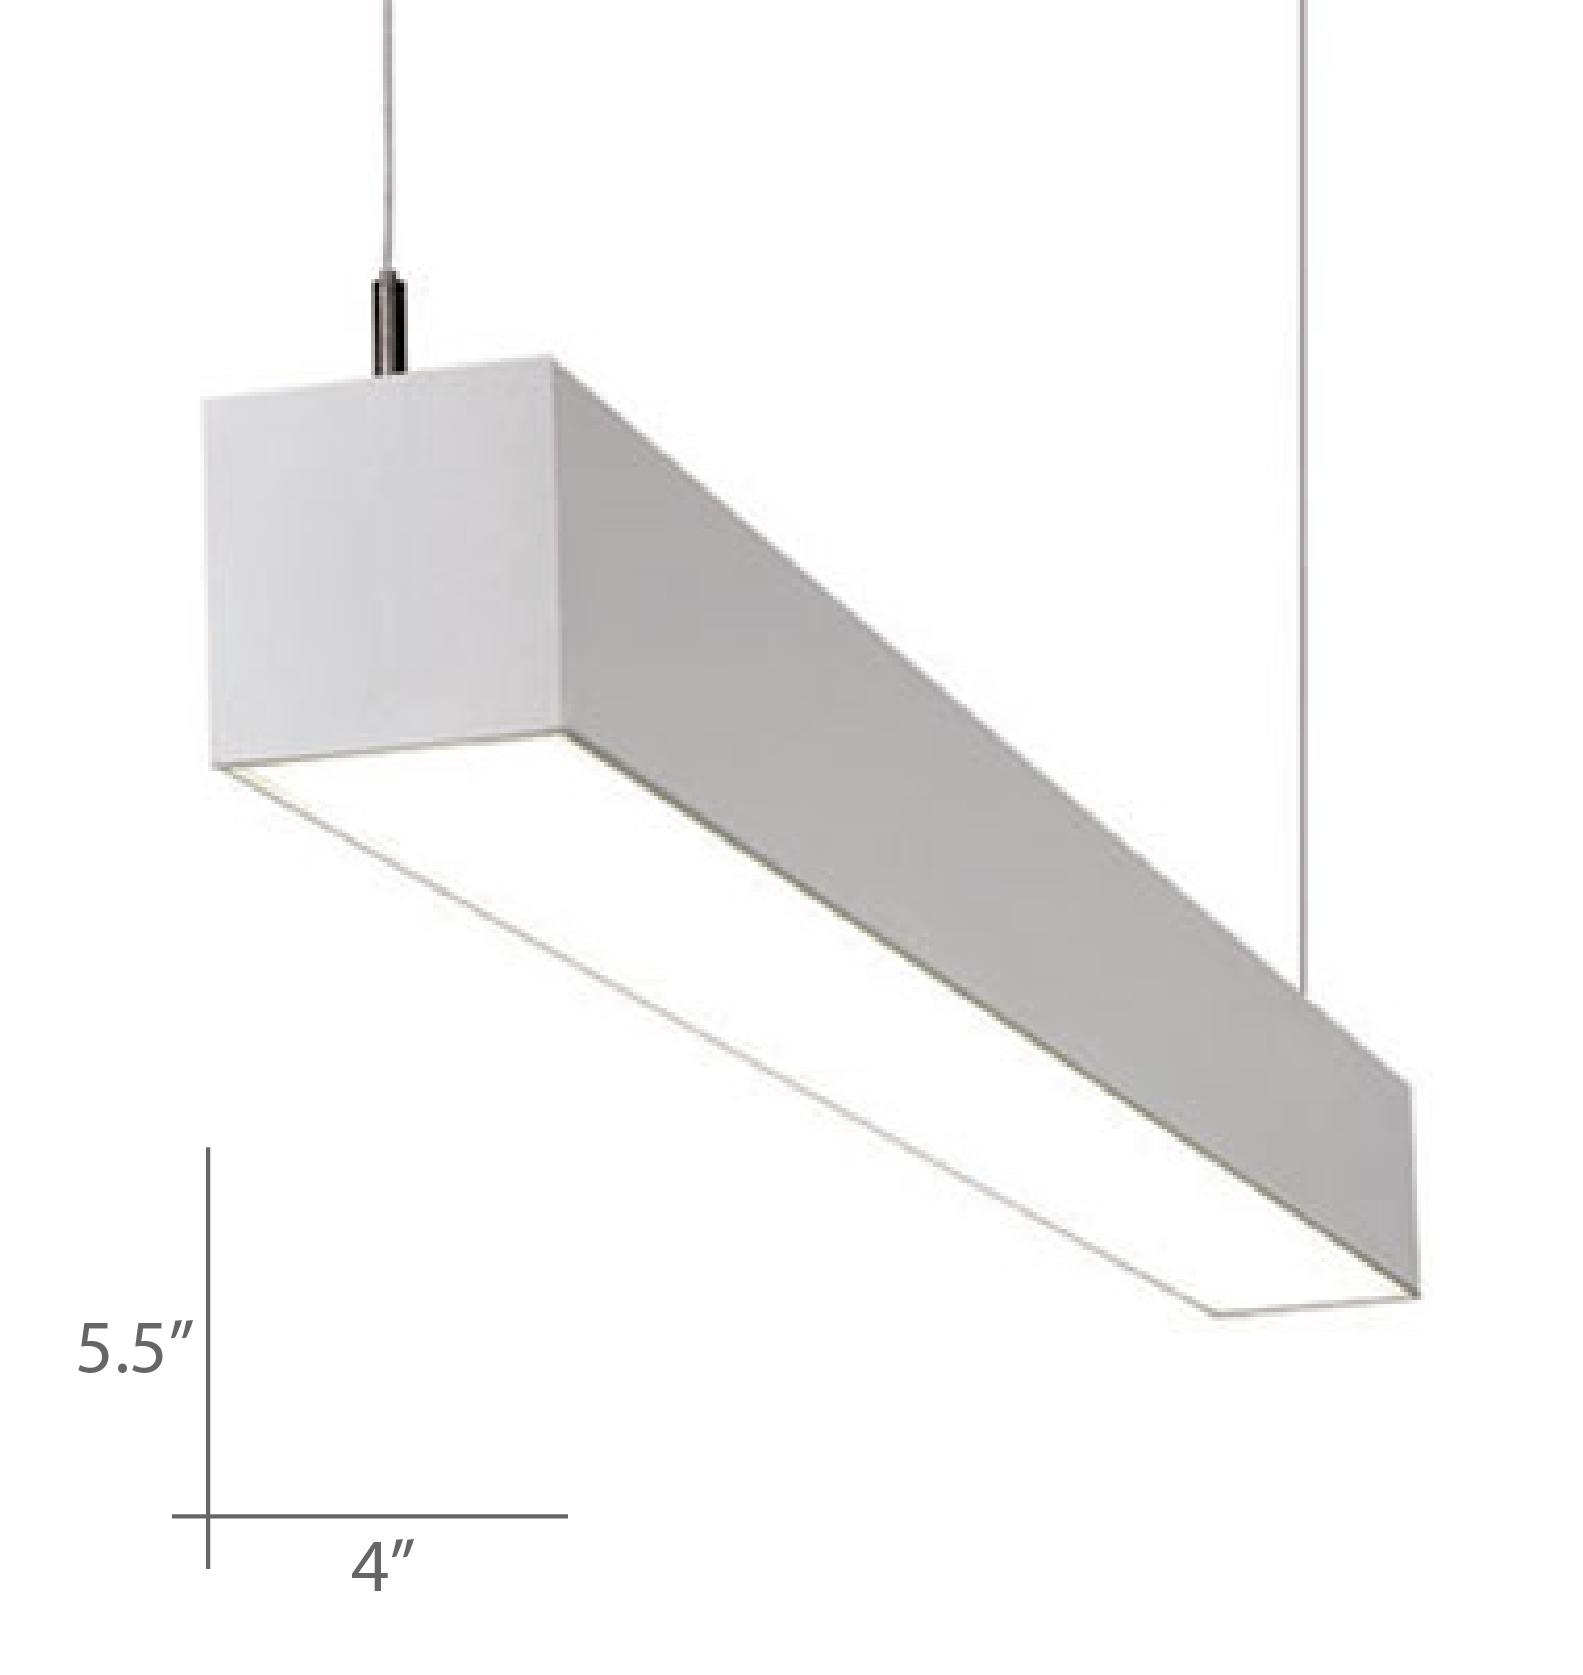 Alcon lighting 12100 45 p continuum 45 series architectural led